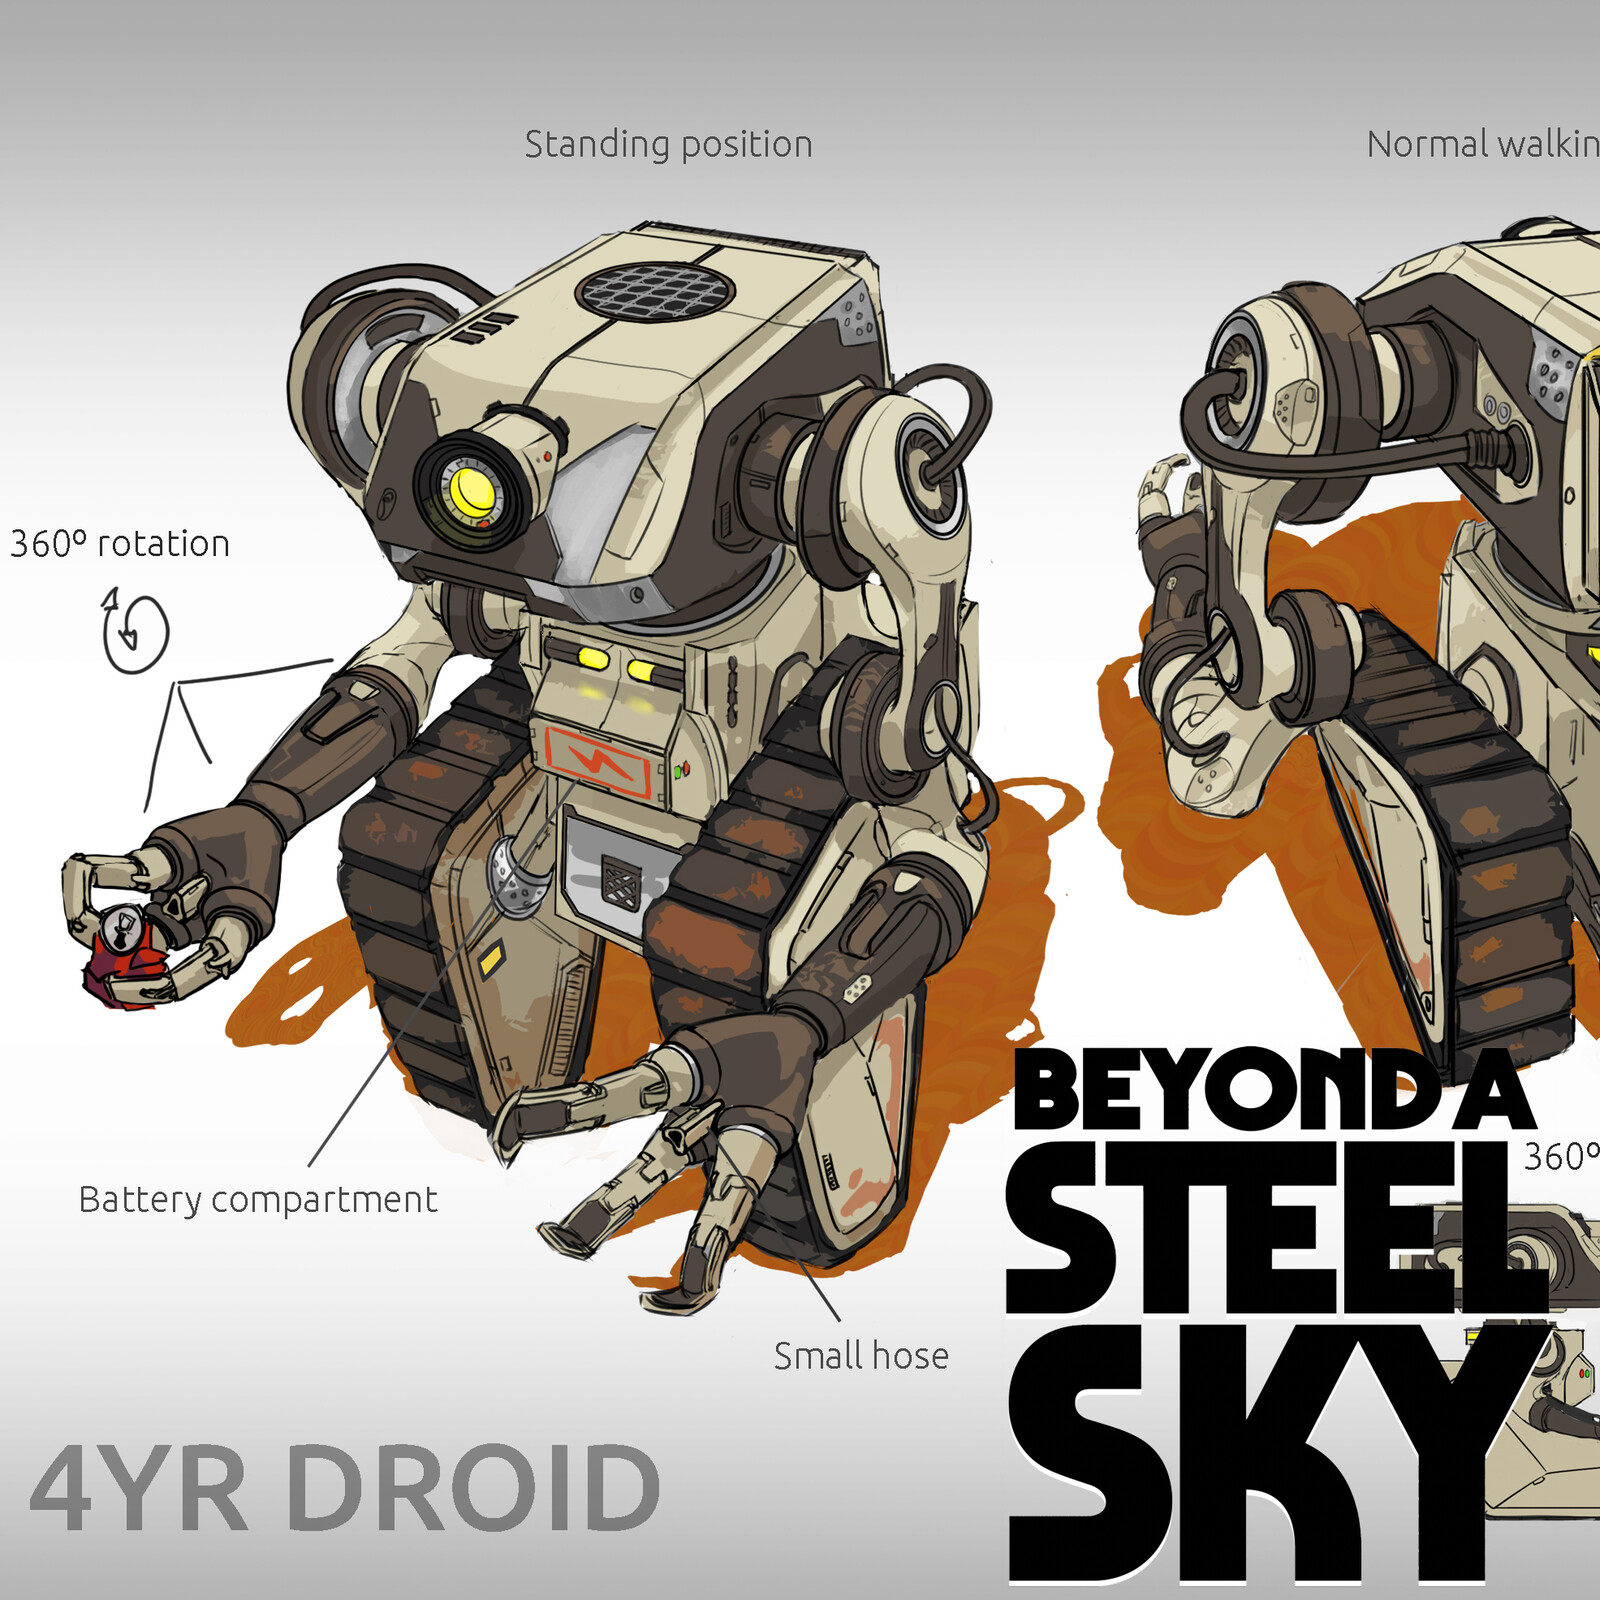 BEYOND A STEEL SKY: 4YR